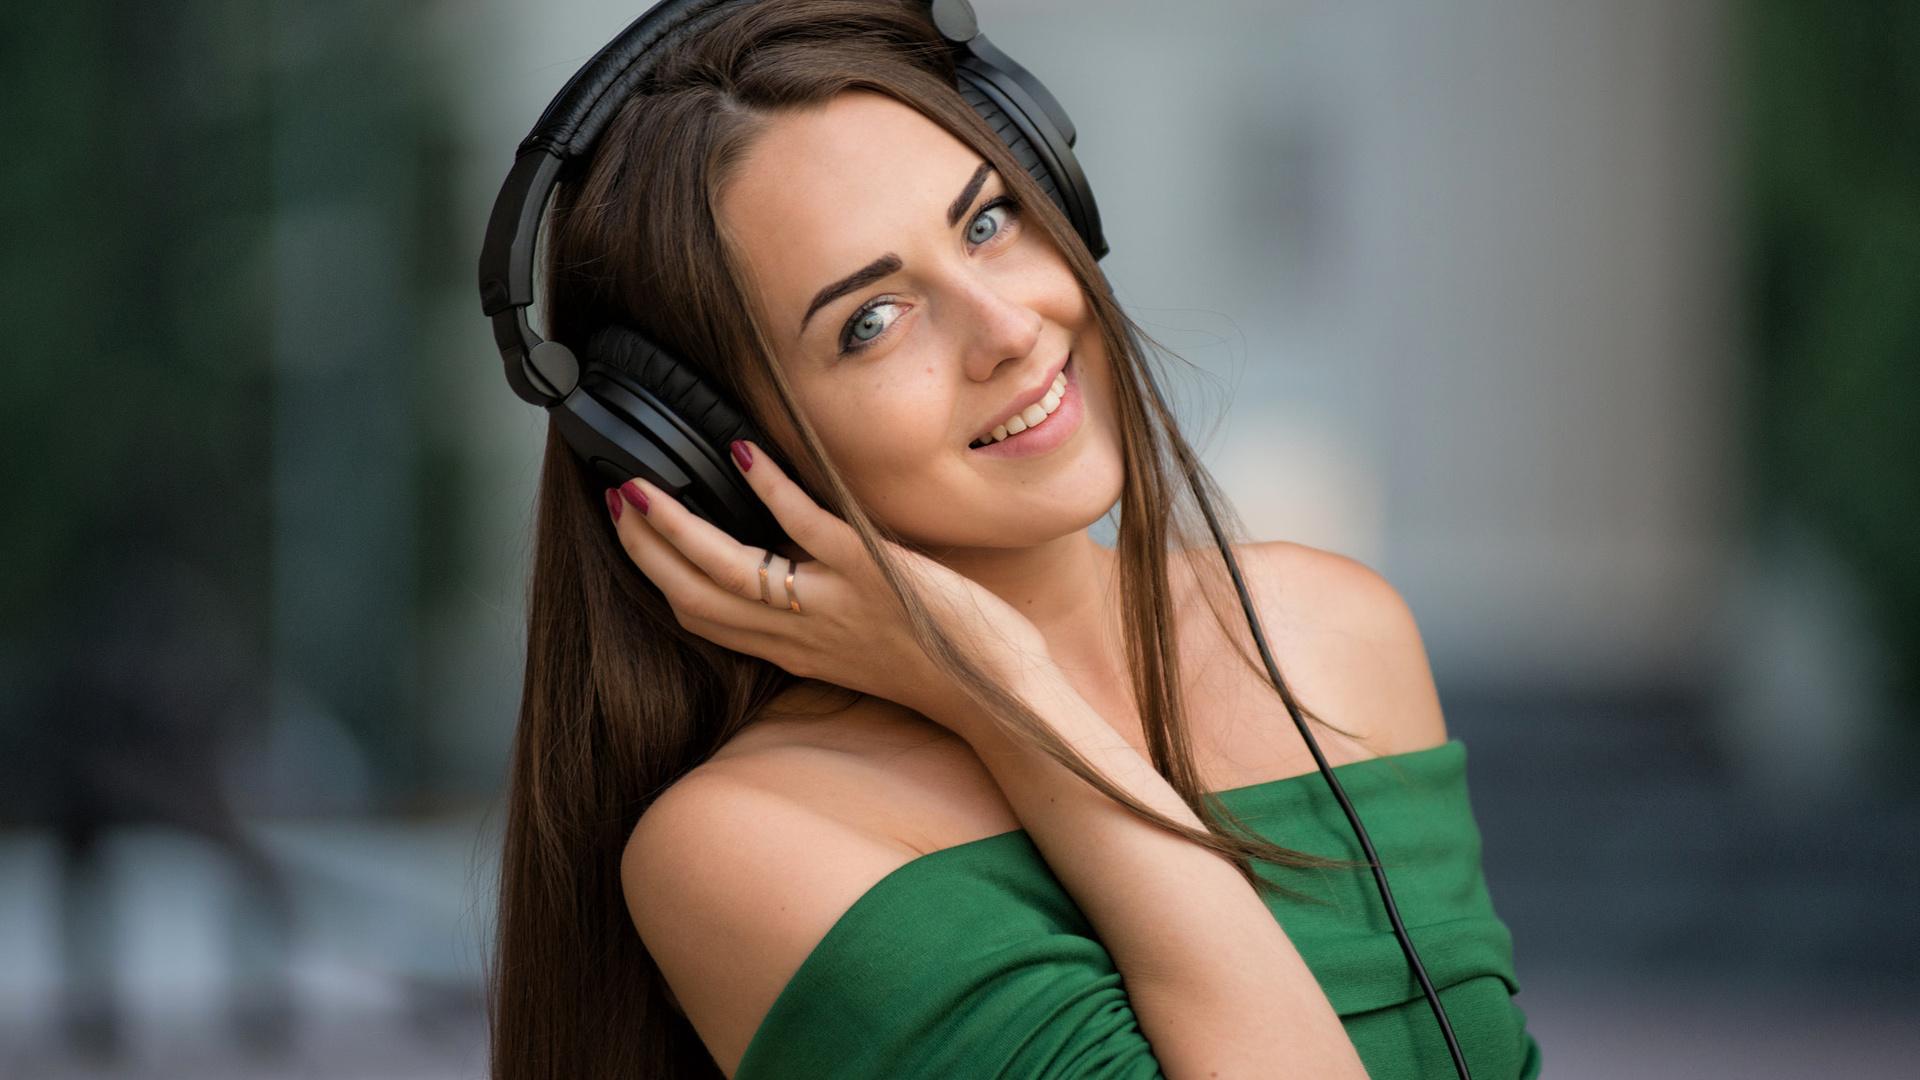 Картинки музыка девушки с наушниками